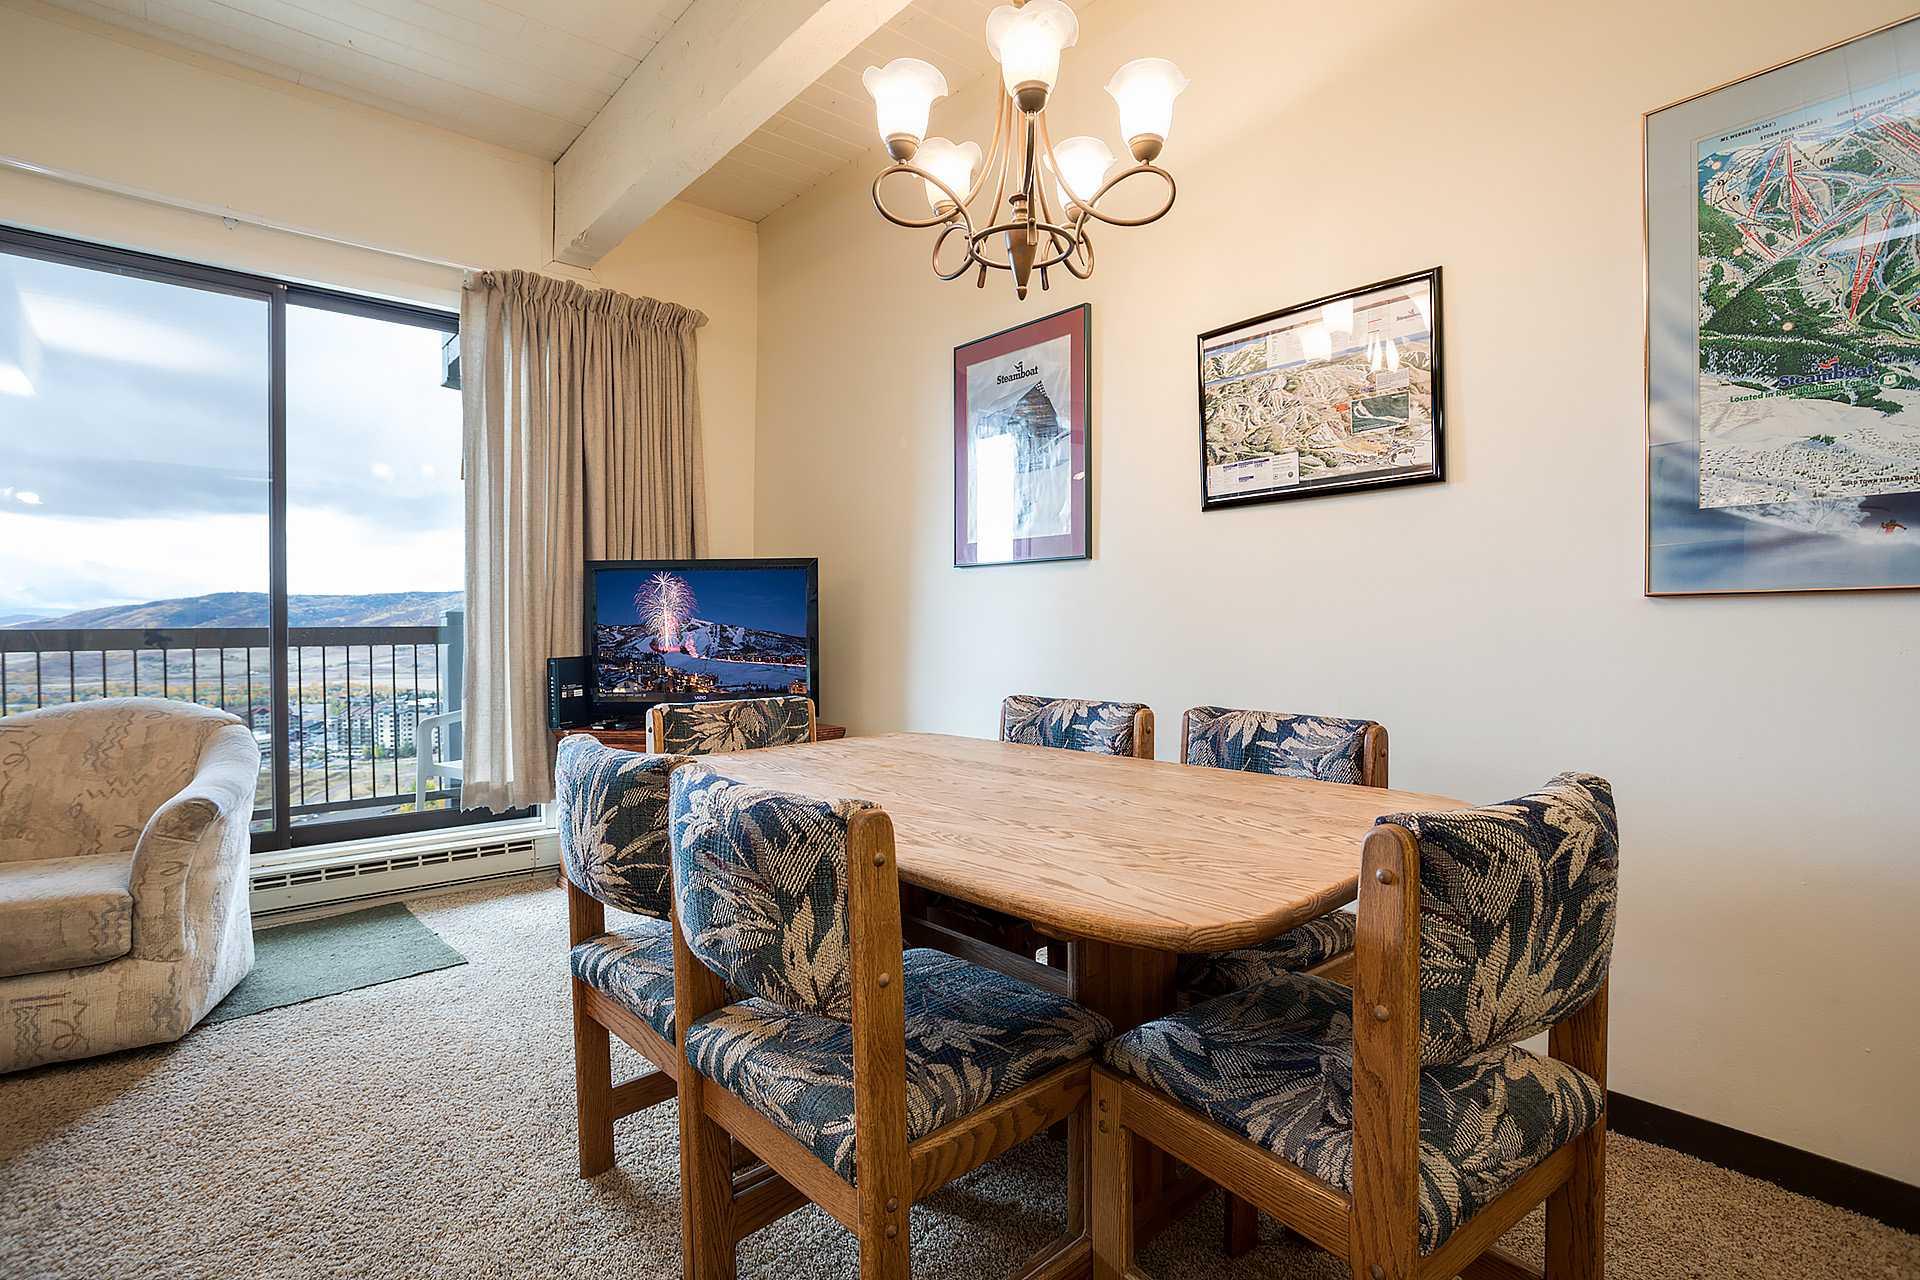 CA317: Storm Meadows Club A Condominiums